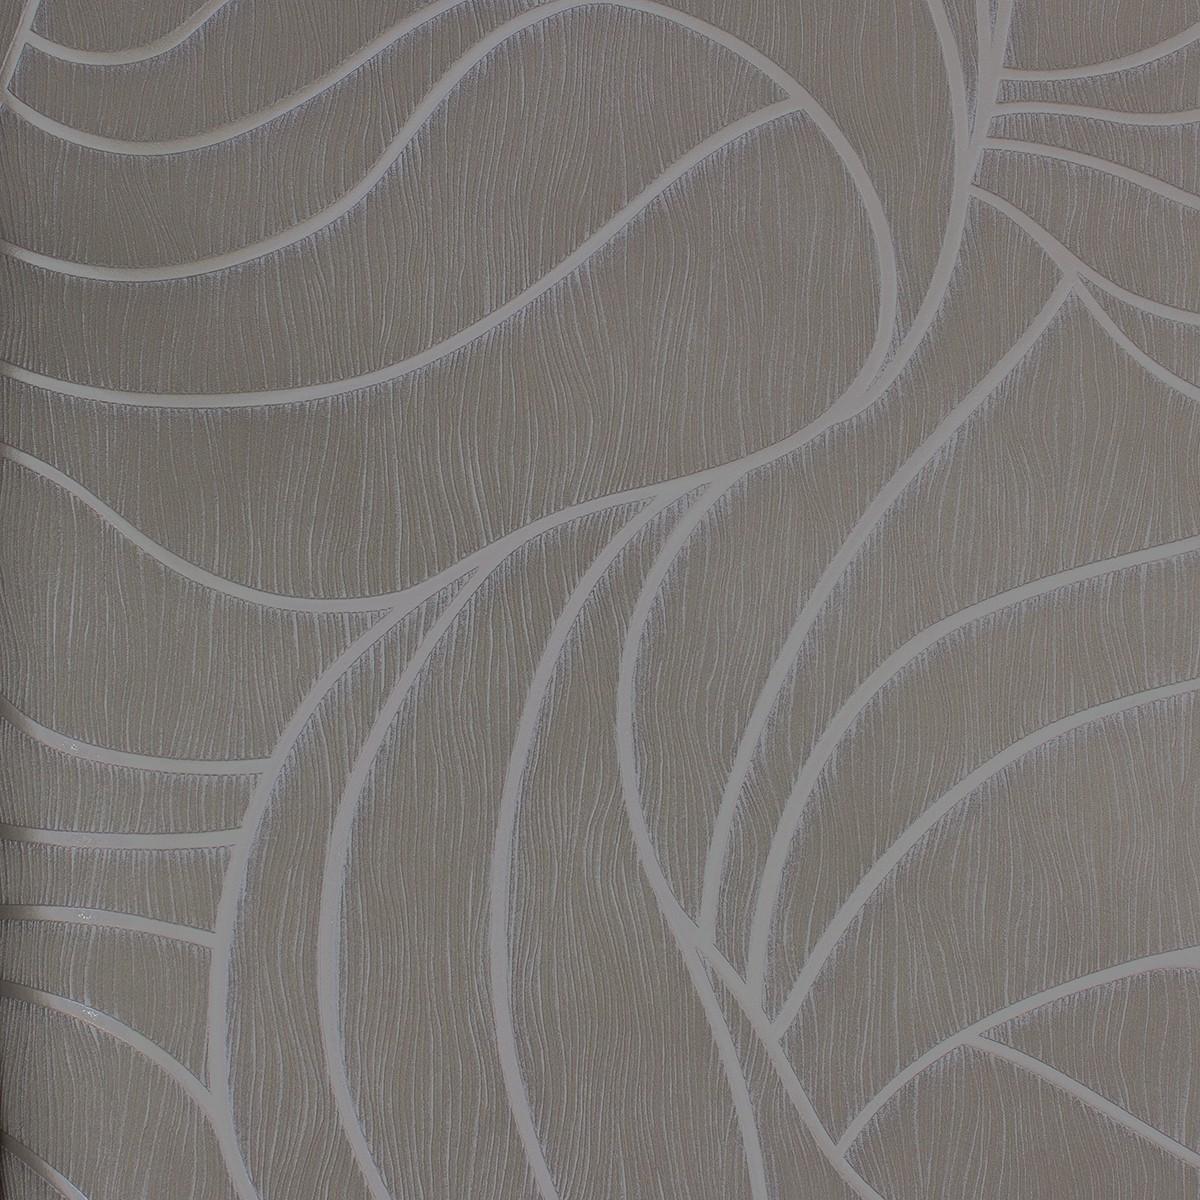 vliestapete luigi colani grafisch grau silber 53346. Black Bedroom Furniture Sets. Home Design Ideas